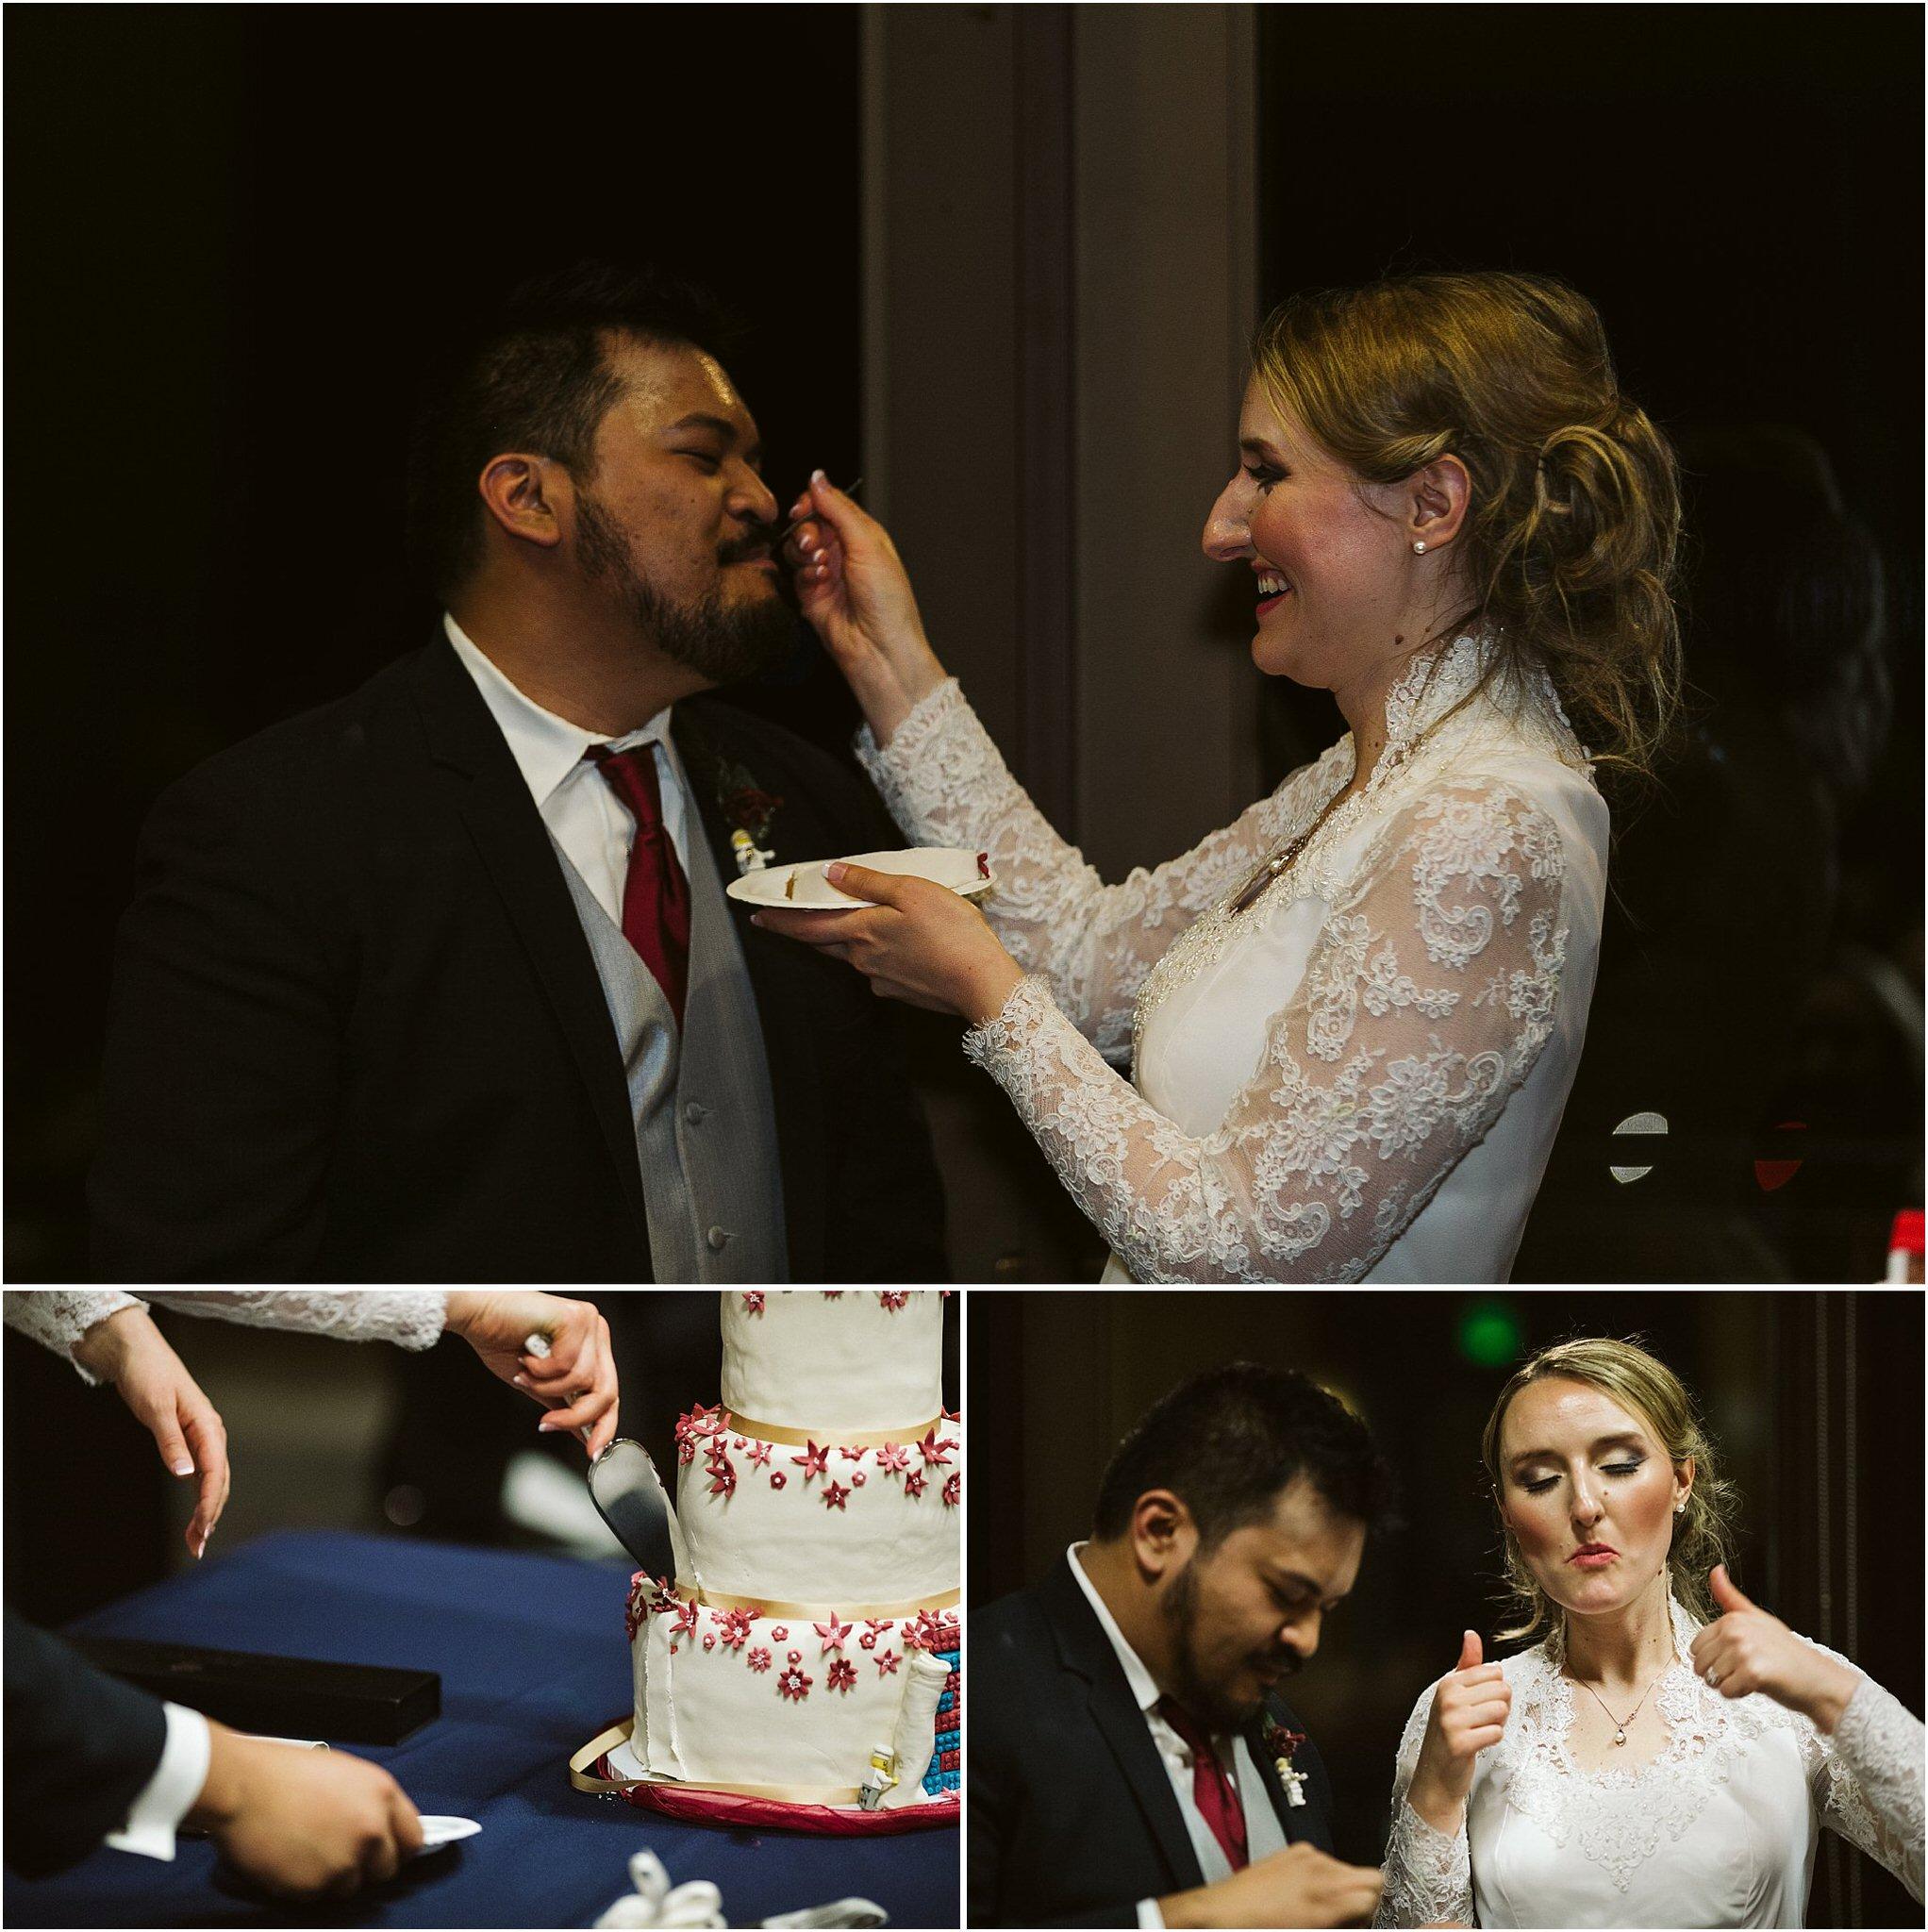 katy-robin-married-in-mukilteo-wedding42.jpg